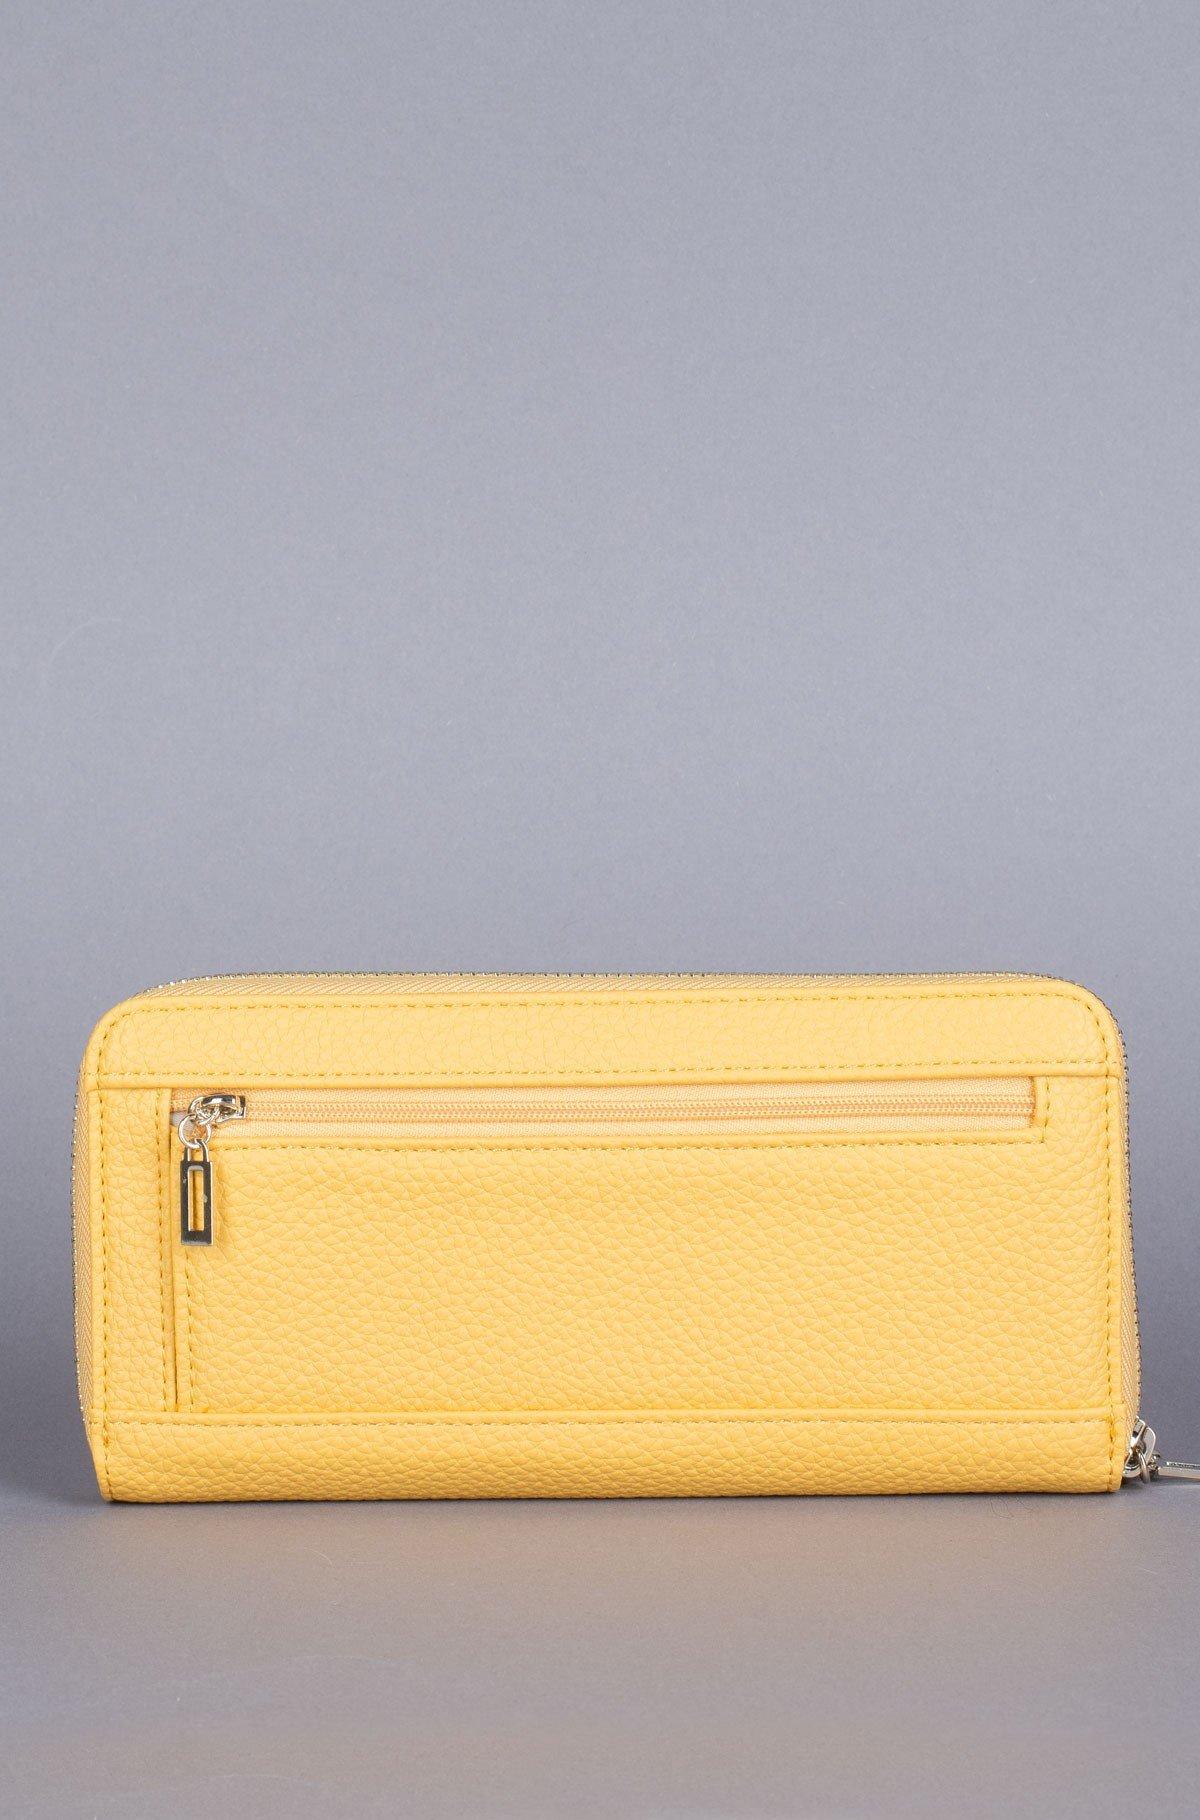 Wallet SWVG73 01460-full-3